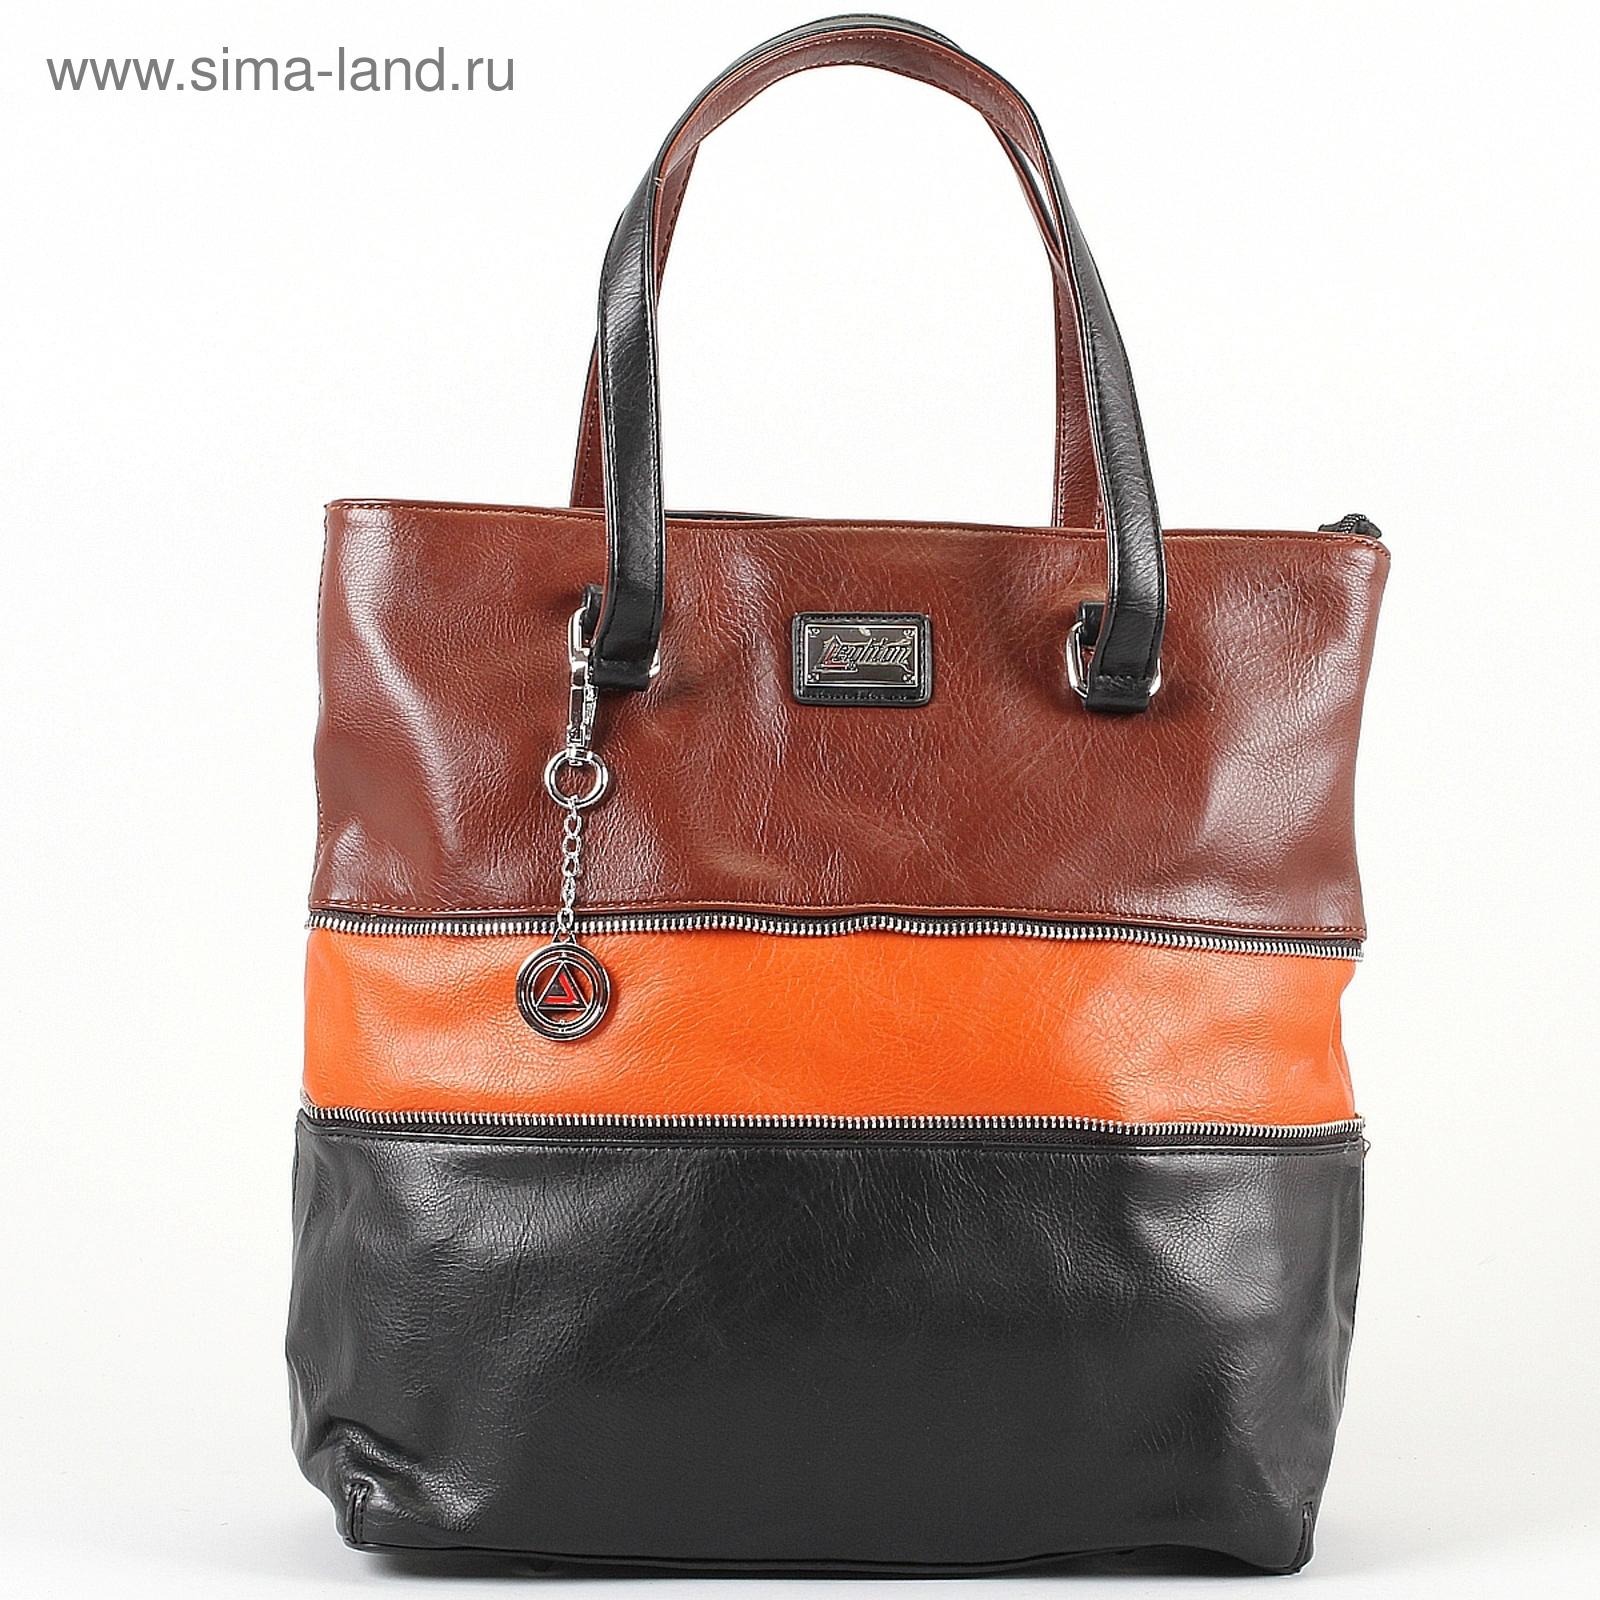 aeae66aa5f01 Сумка женская, гладкая кожа, чёрная-коричневая-рыжая (145407 ...